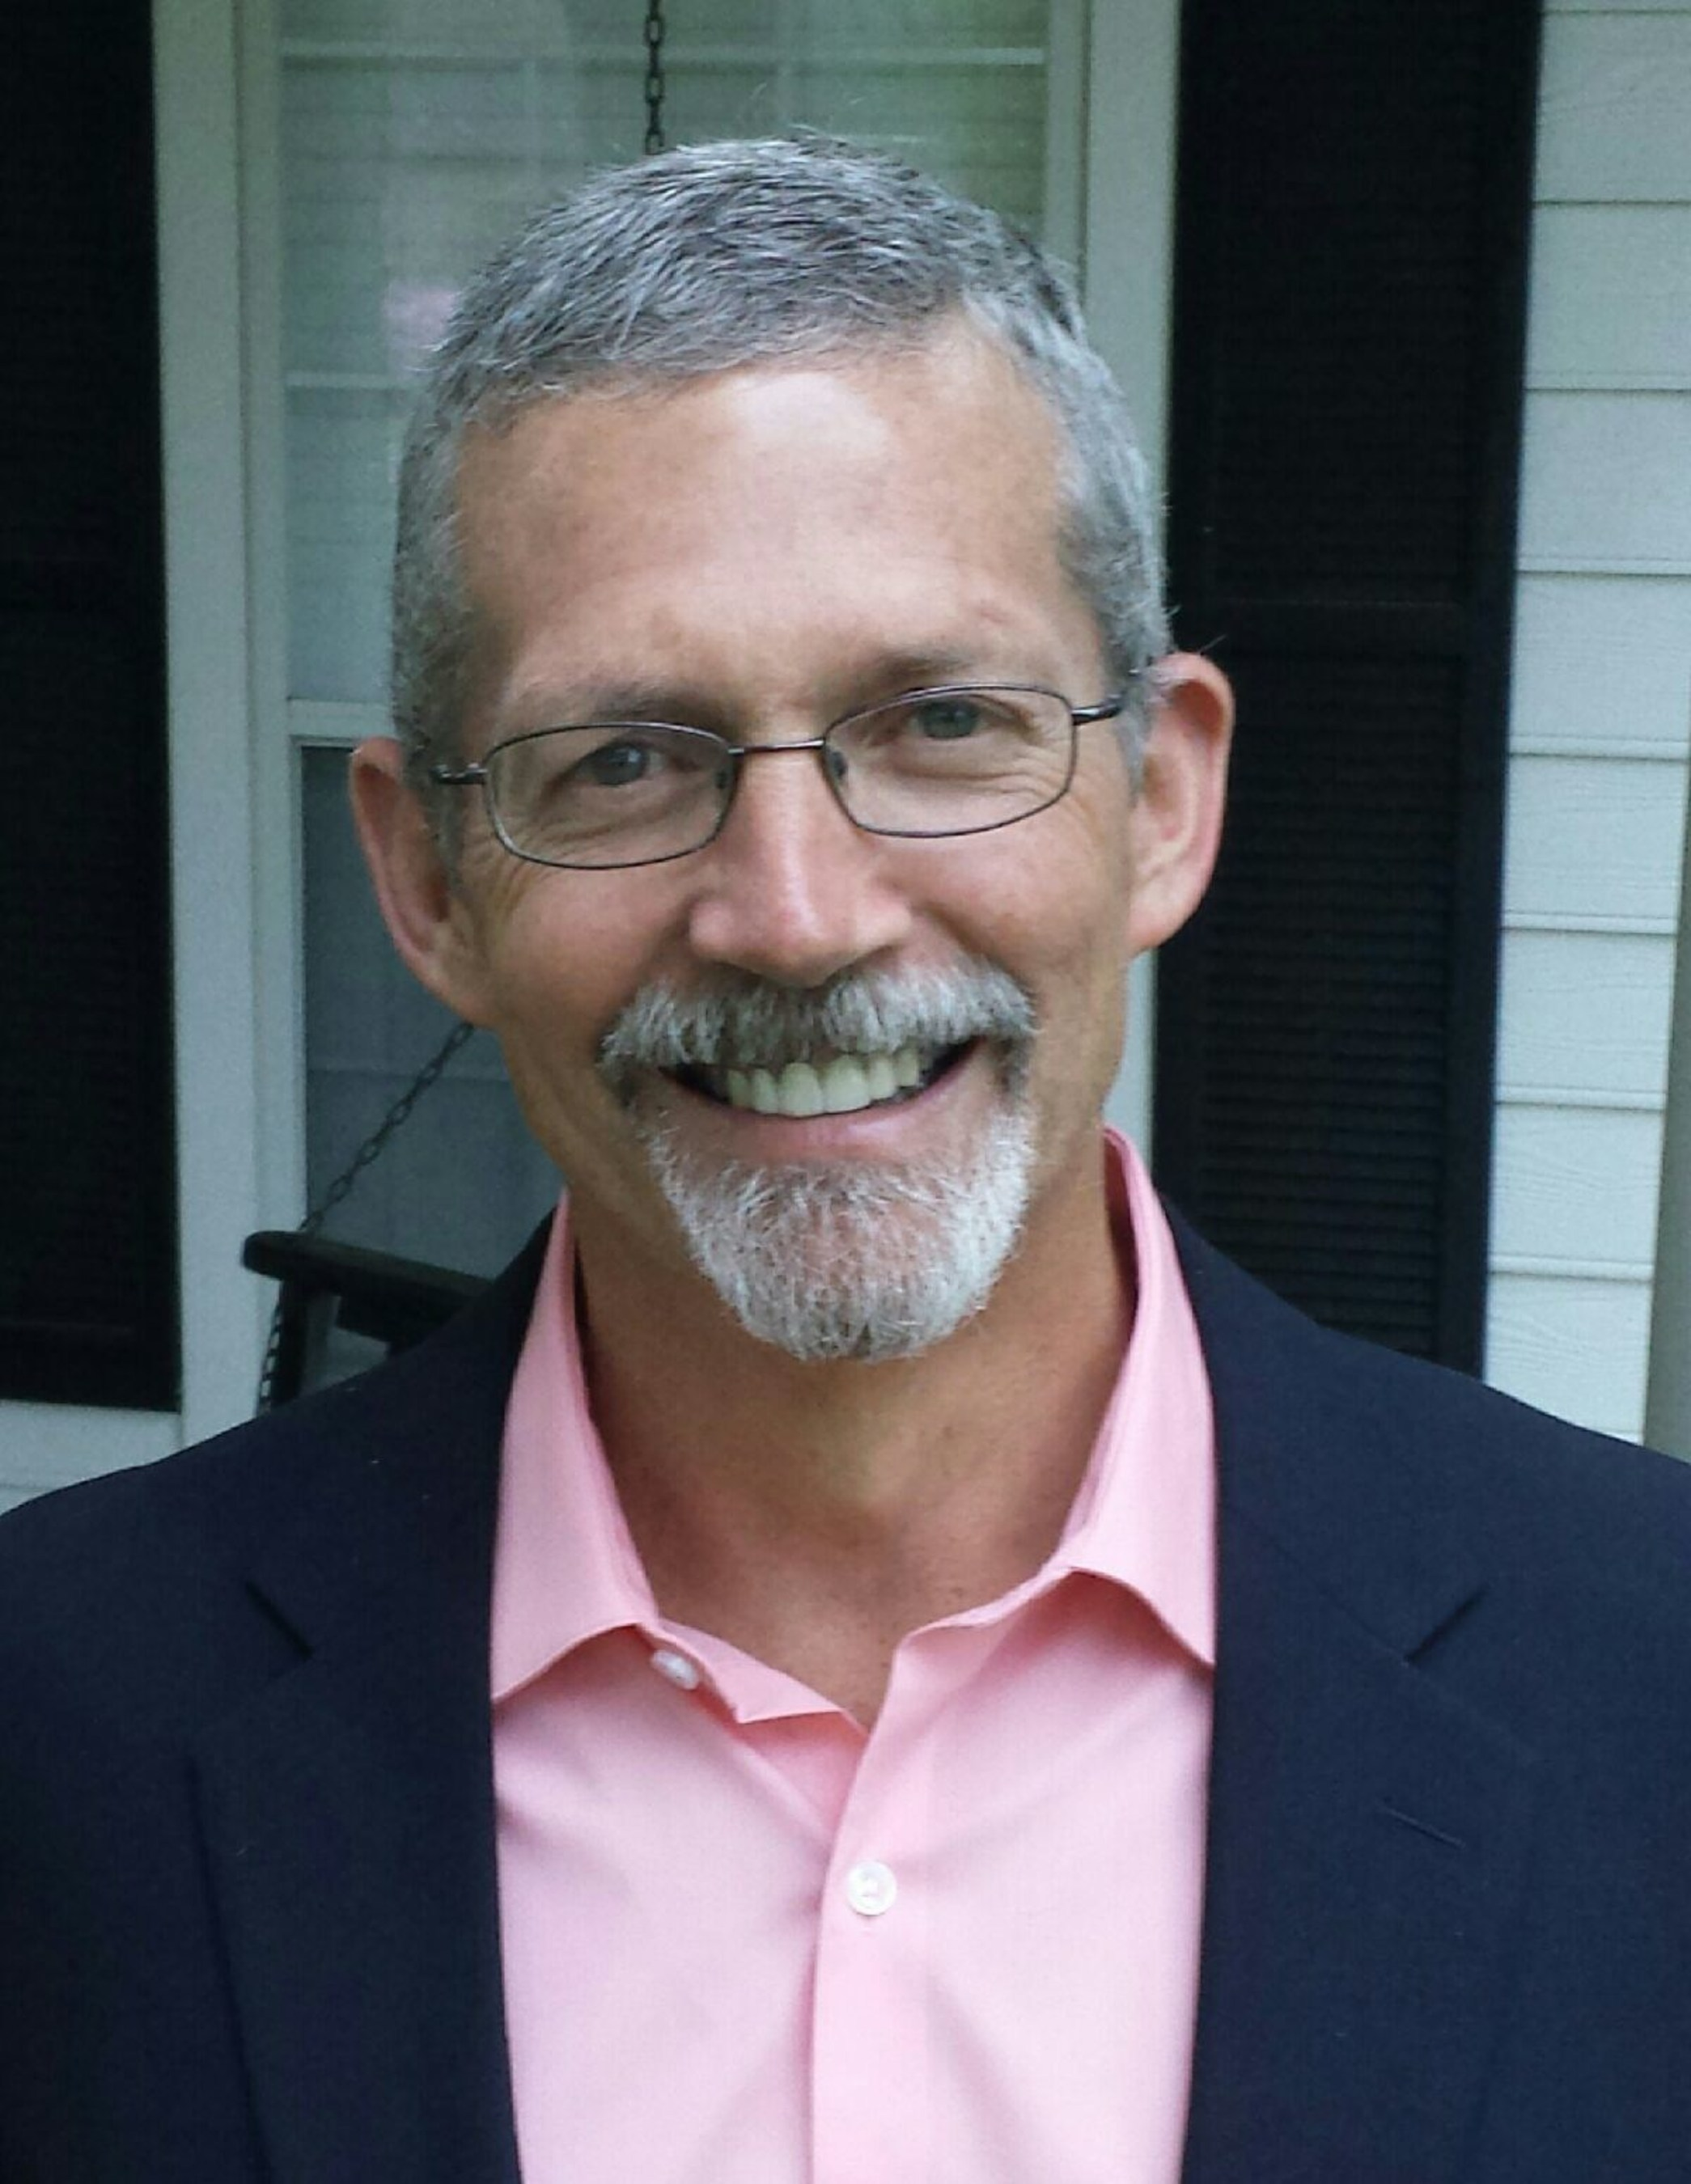 Marshland Foods partner, Robert Ray